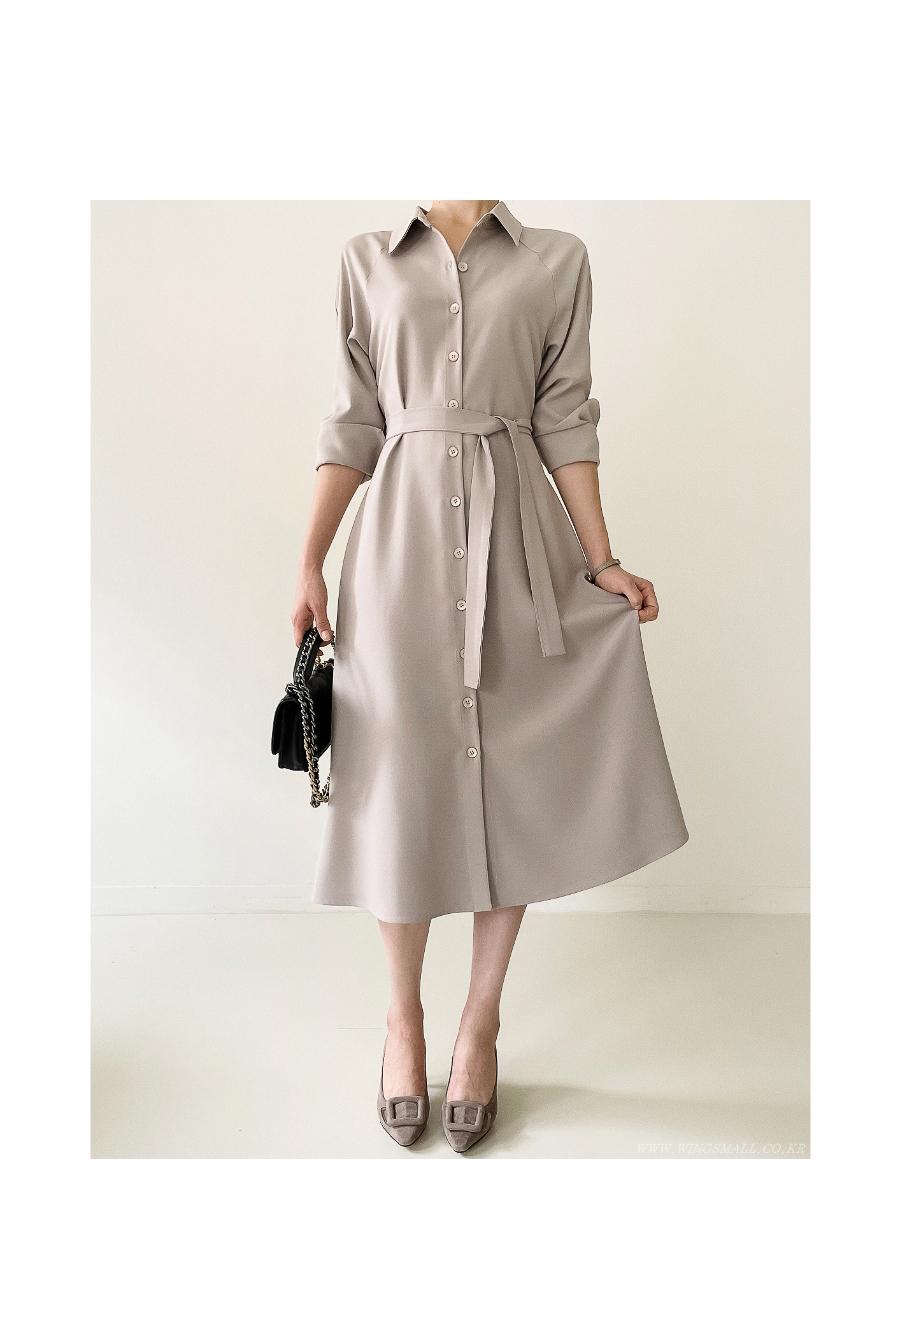 long dress detail image-S5L2